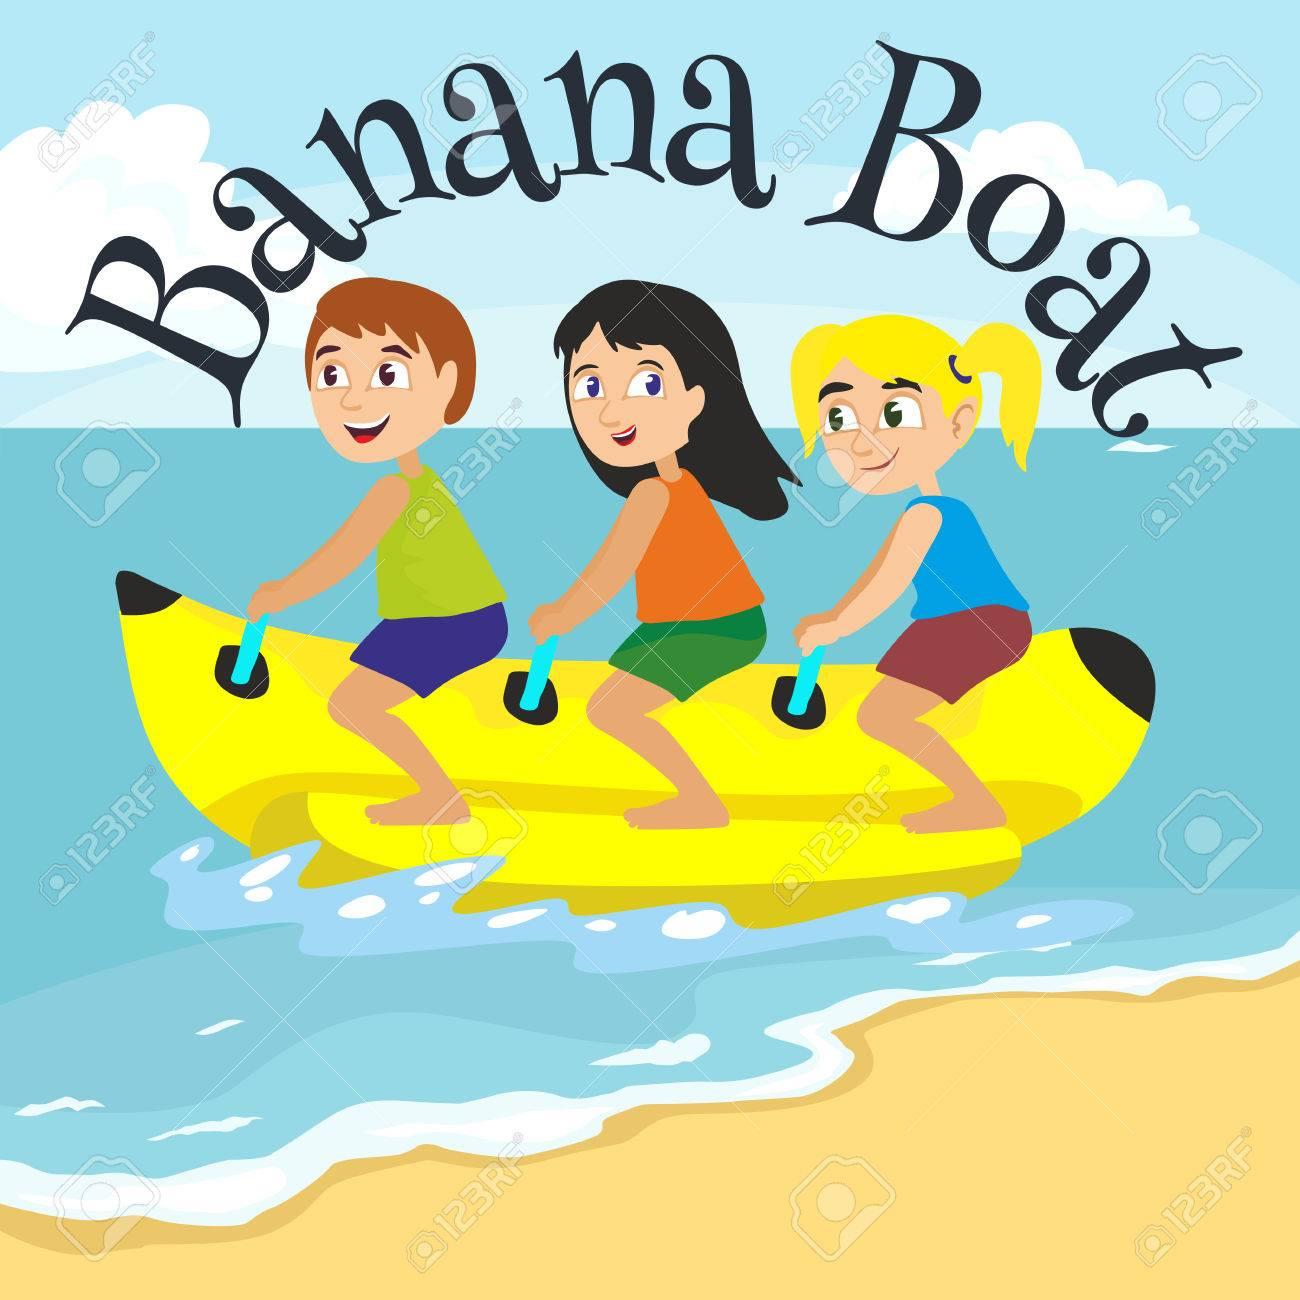 SYBING Love Banana Boys Funny Quick Dry Waterproof Surfing Sports Running Swim Trunks